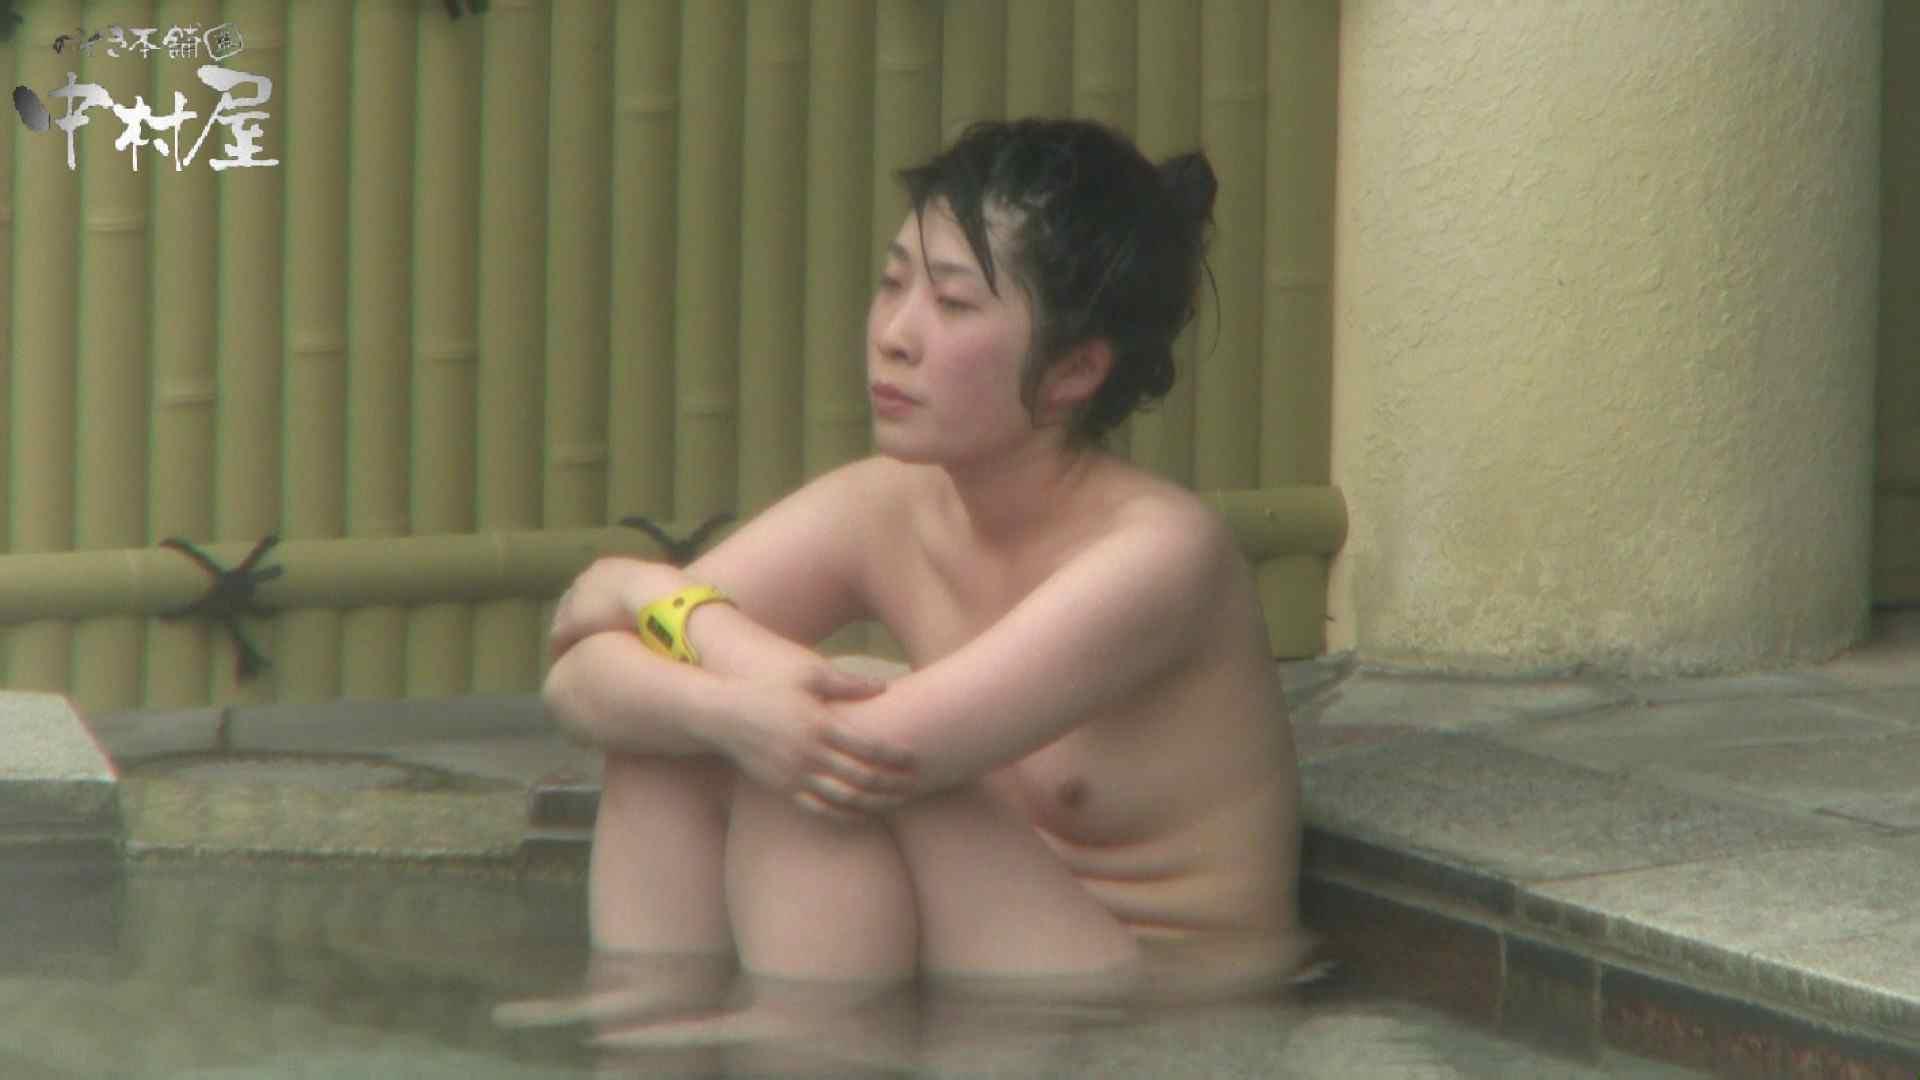 Aquaな露天風呂Vol.955 盗撮師作品   露天風呂突入  85pic 55